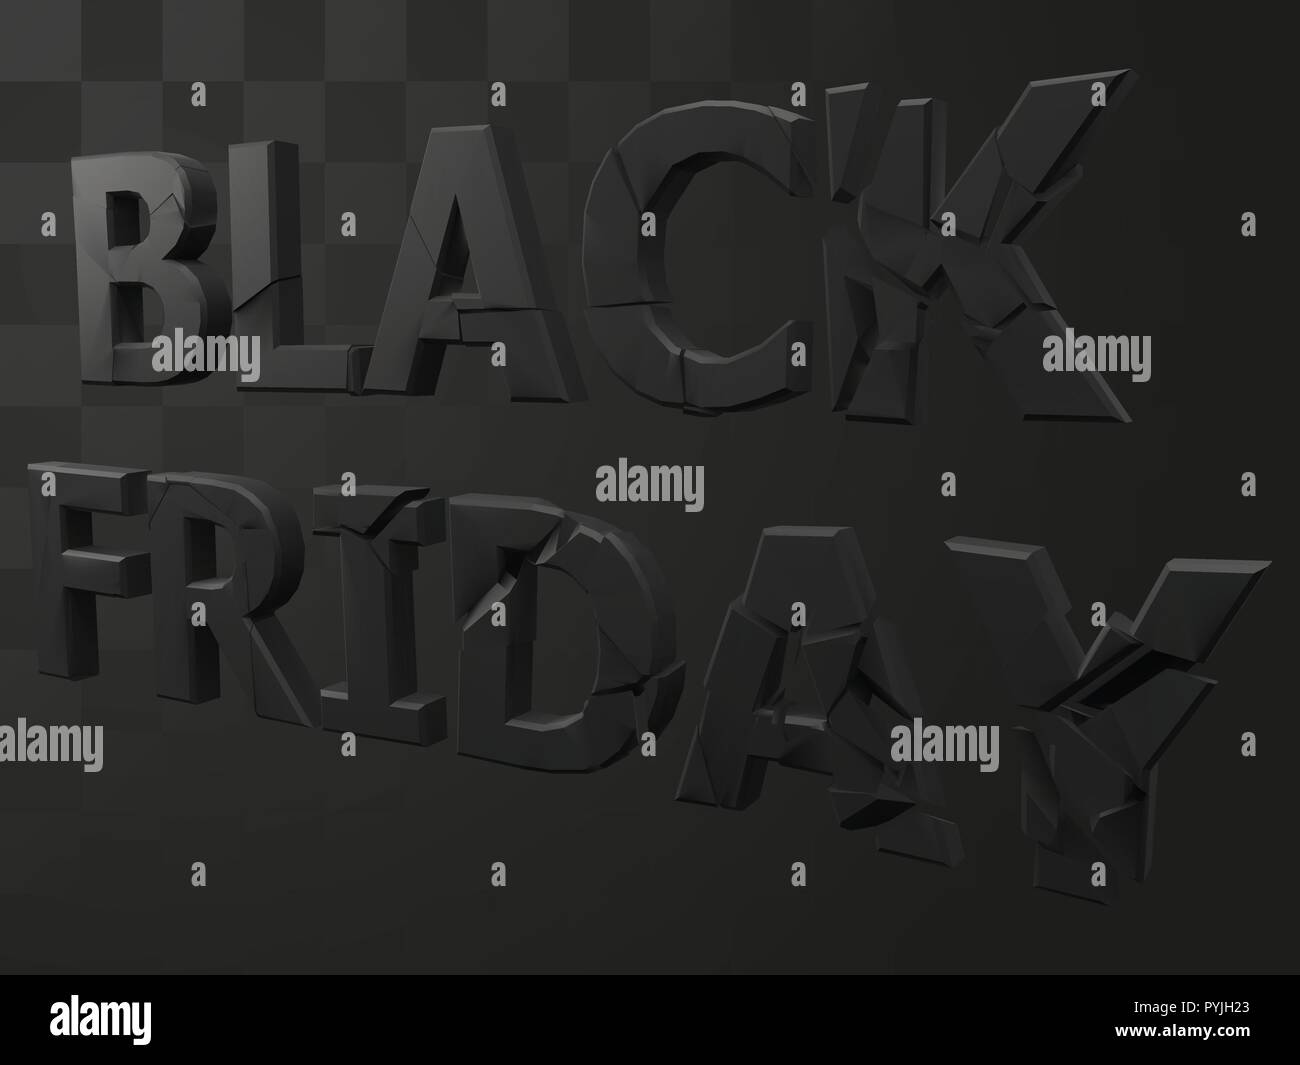 vector illustration of exploding black friday text - Stock Vector